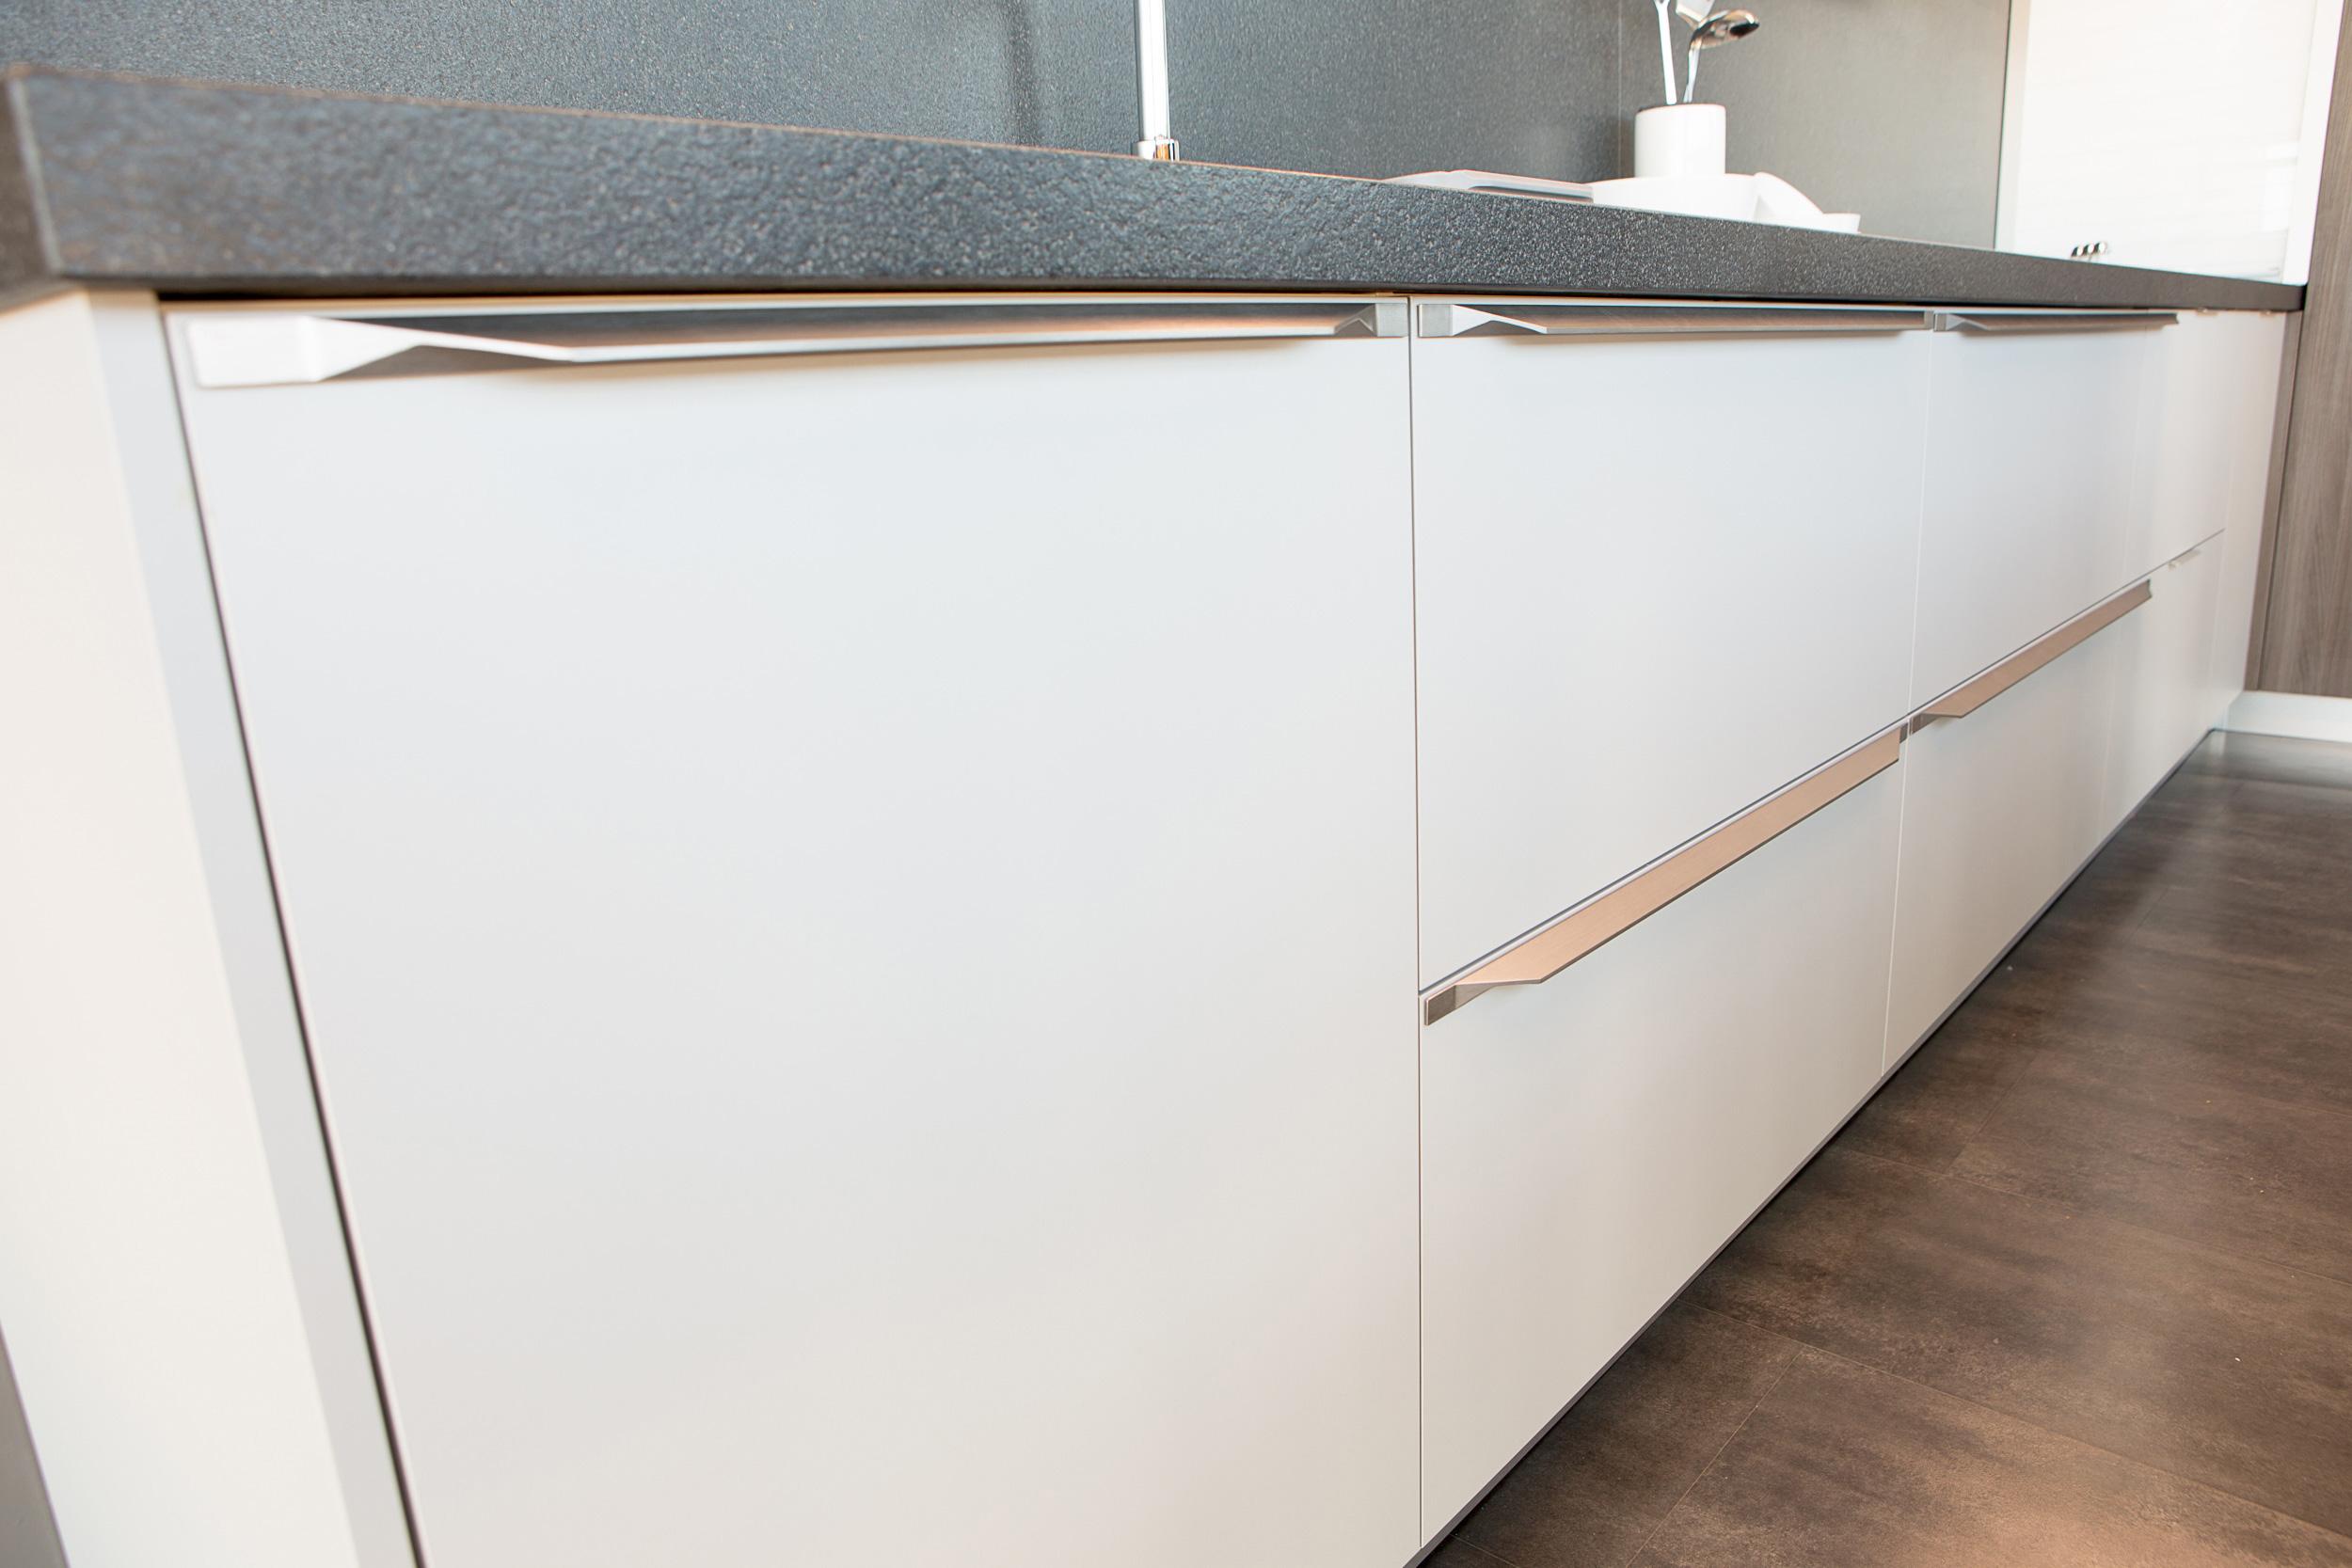 Tamm aluminum kitchen handle by Viefe. Tirador de cocina de aluminio.